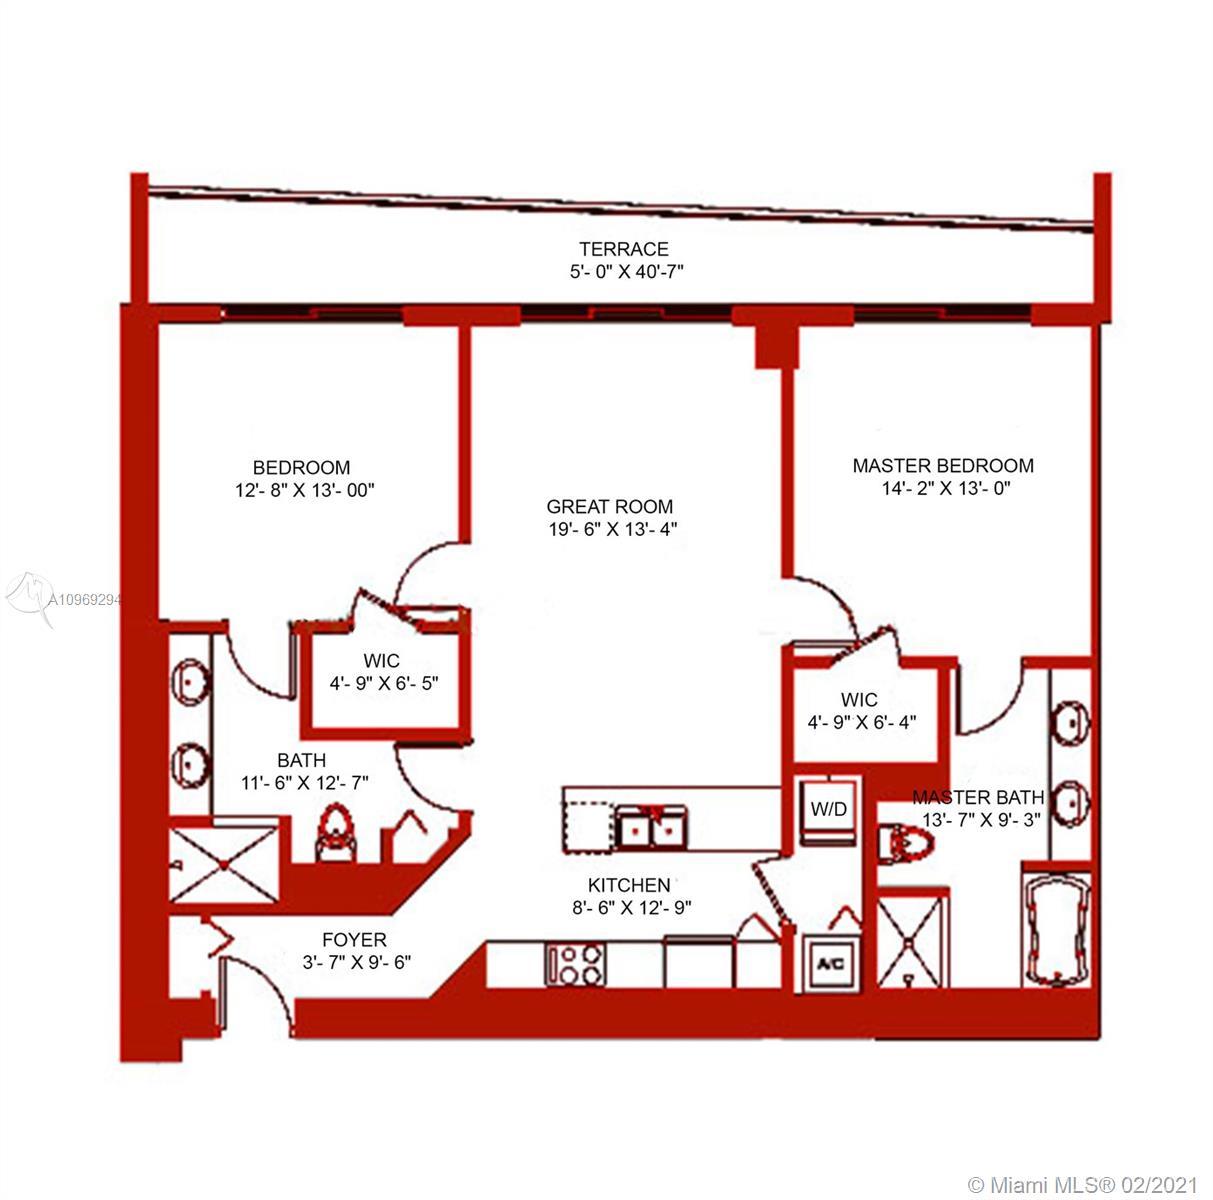 500 Brickell West Tower #3805 - 500 Brickell Ave #3805, Miami, FL 33131